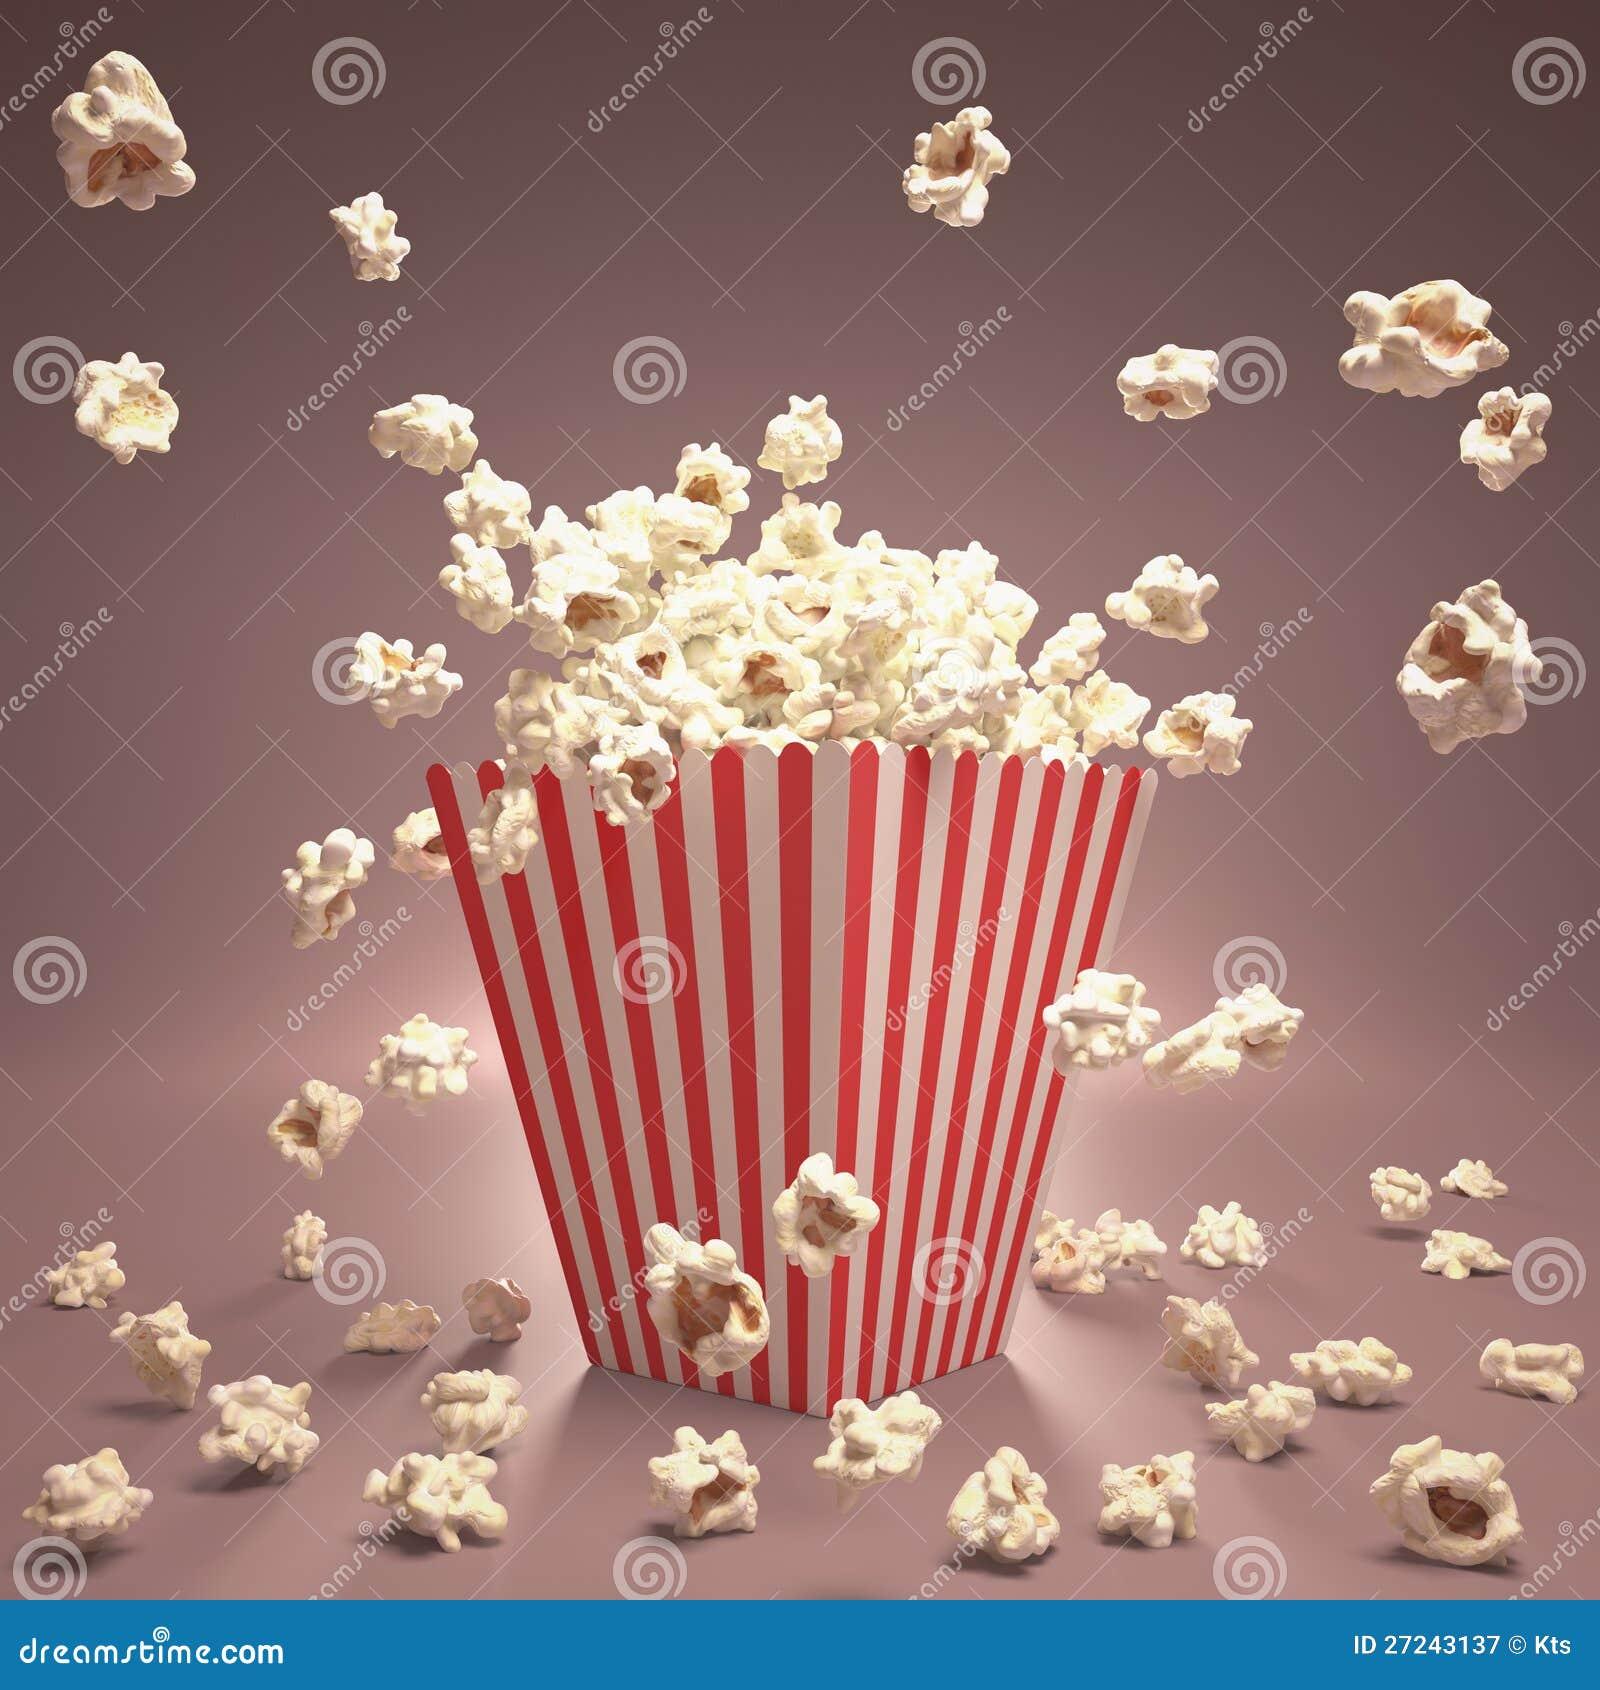 Popcorn Flying Royalty Free Stock Photography - Image: 27243137